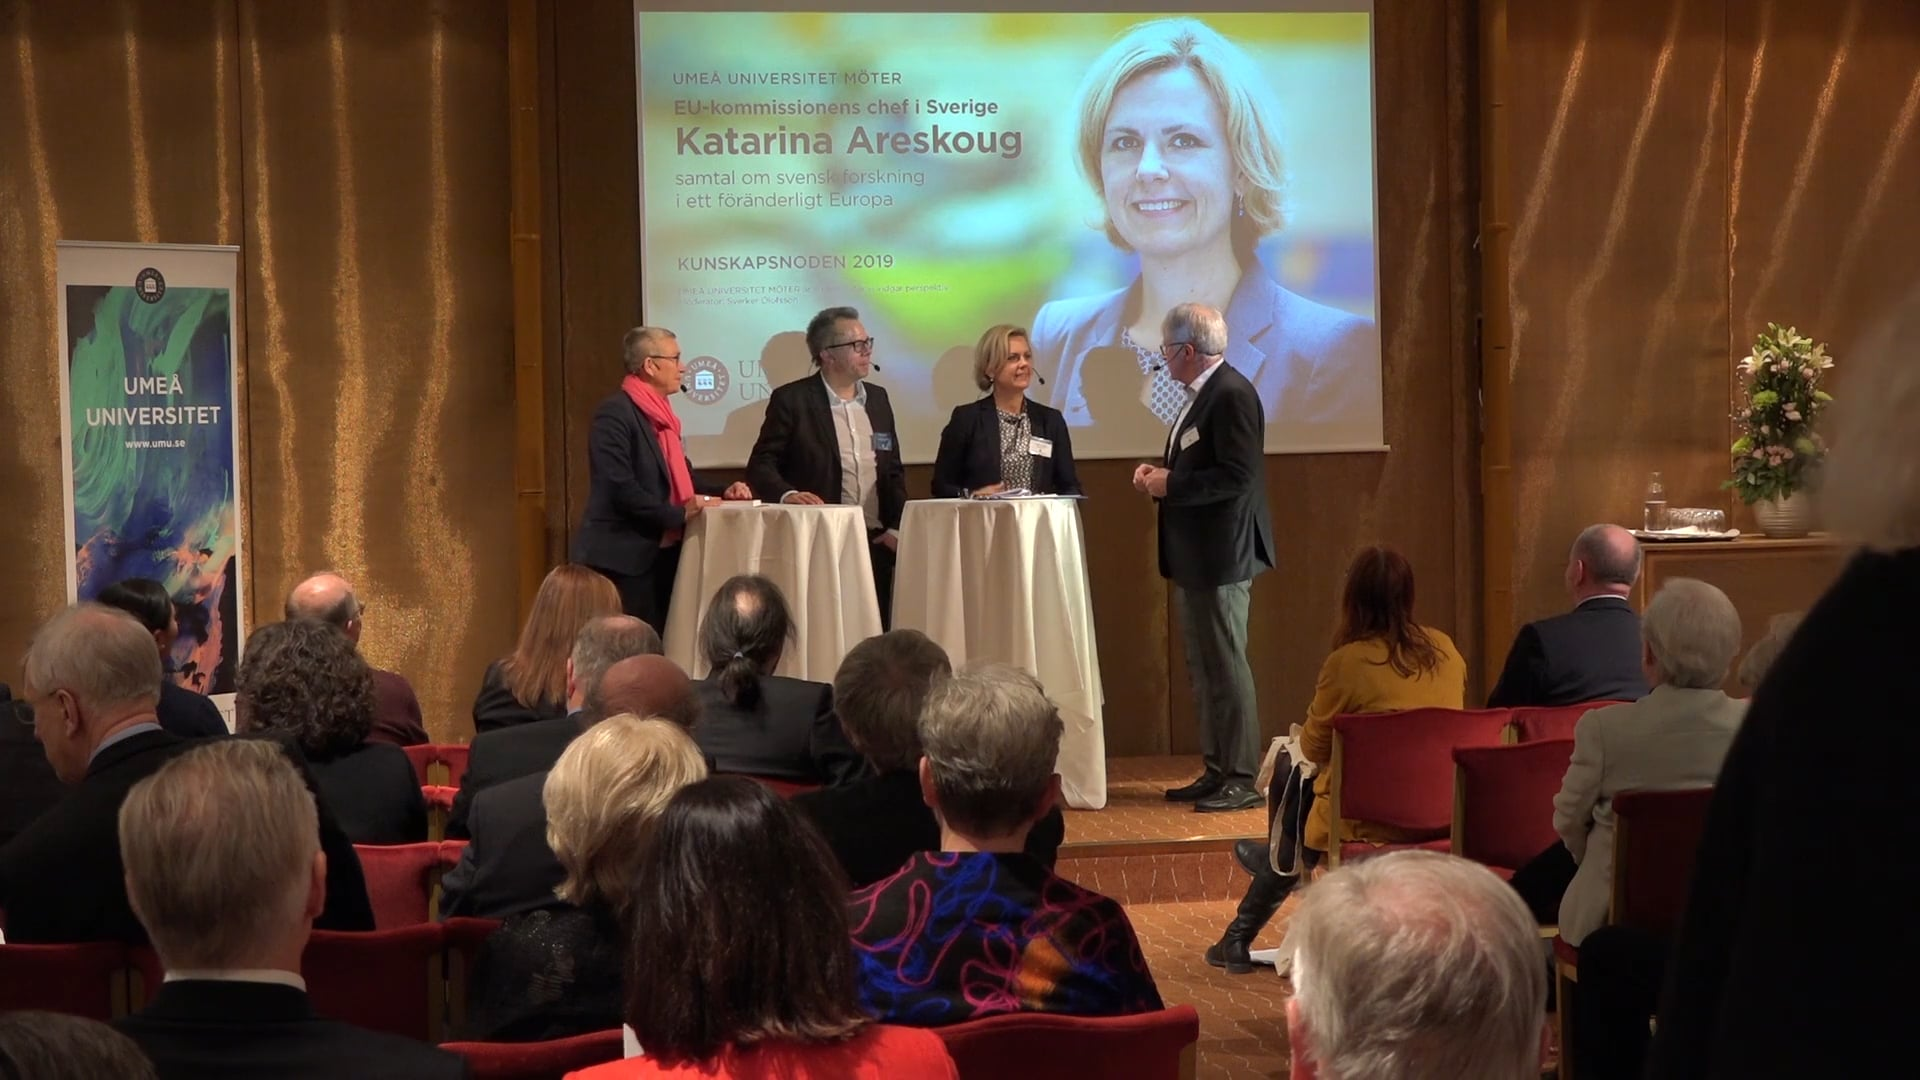 Film: Umeå universitet möter Katarina Areskoug